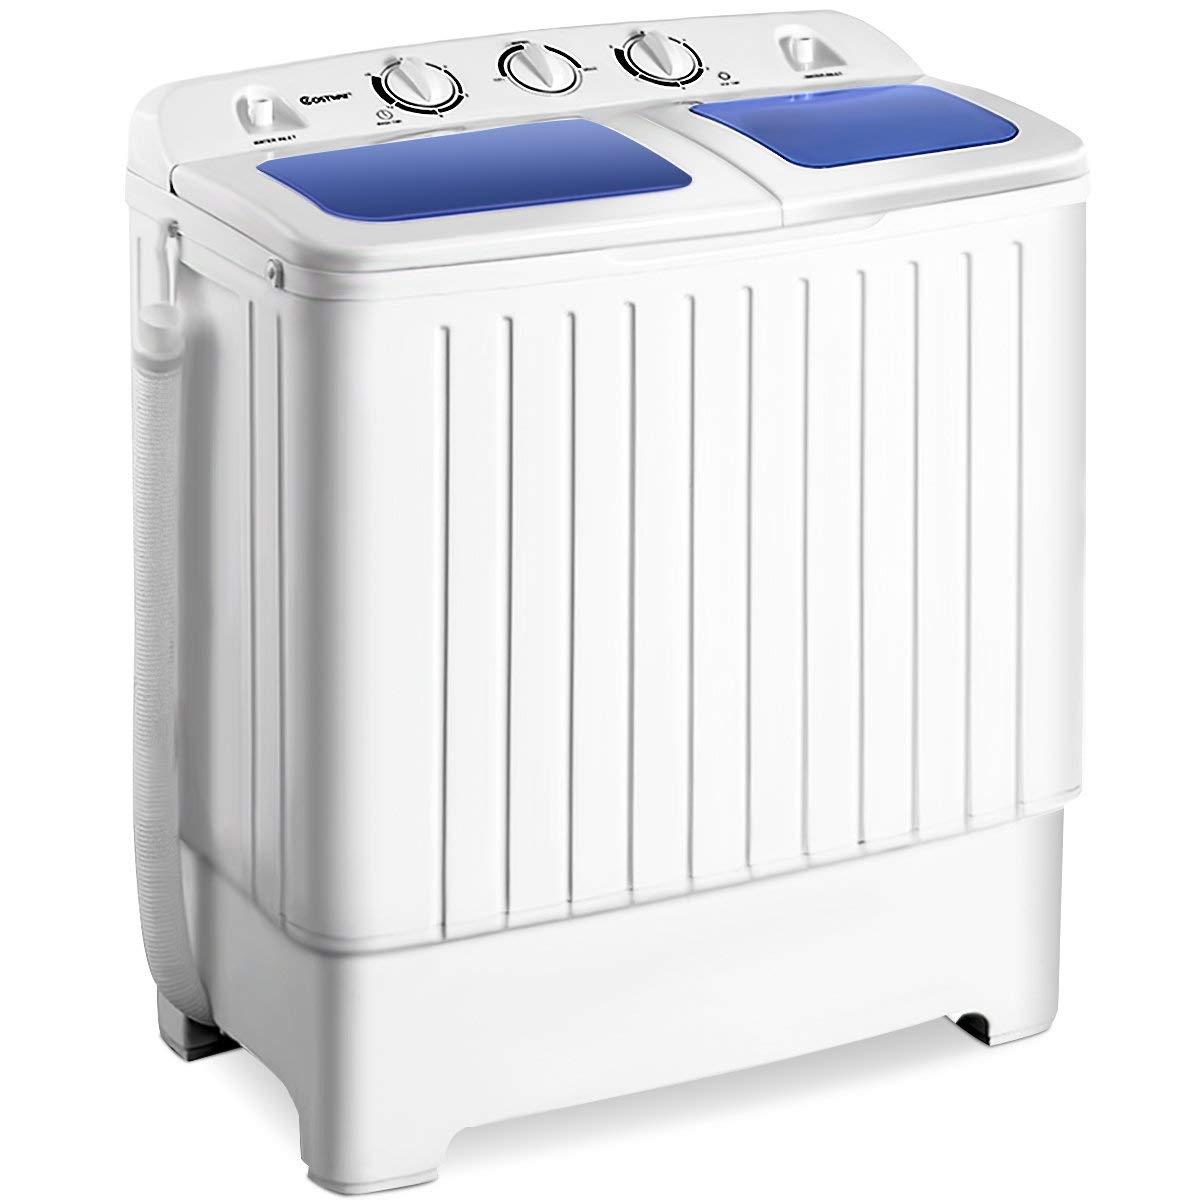 Giantex Portable Mini Compact Twin Tub Washing Machine 17.6lbs Washer Spain Spinner